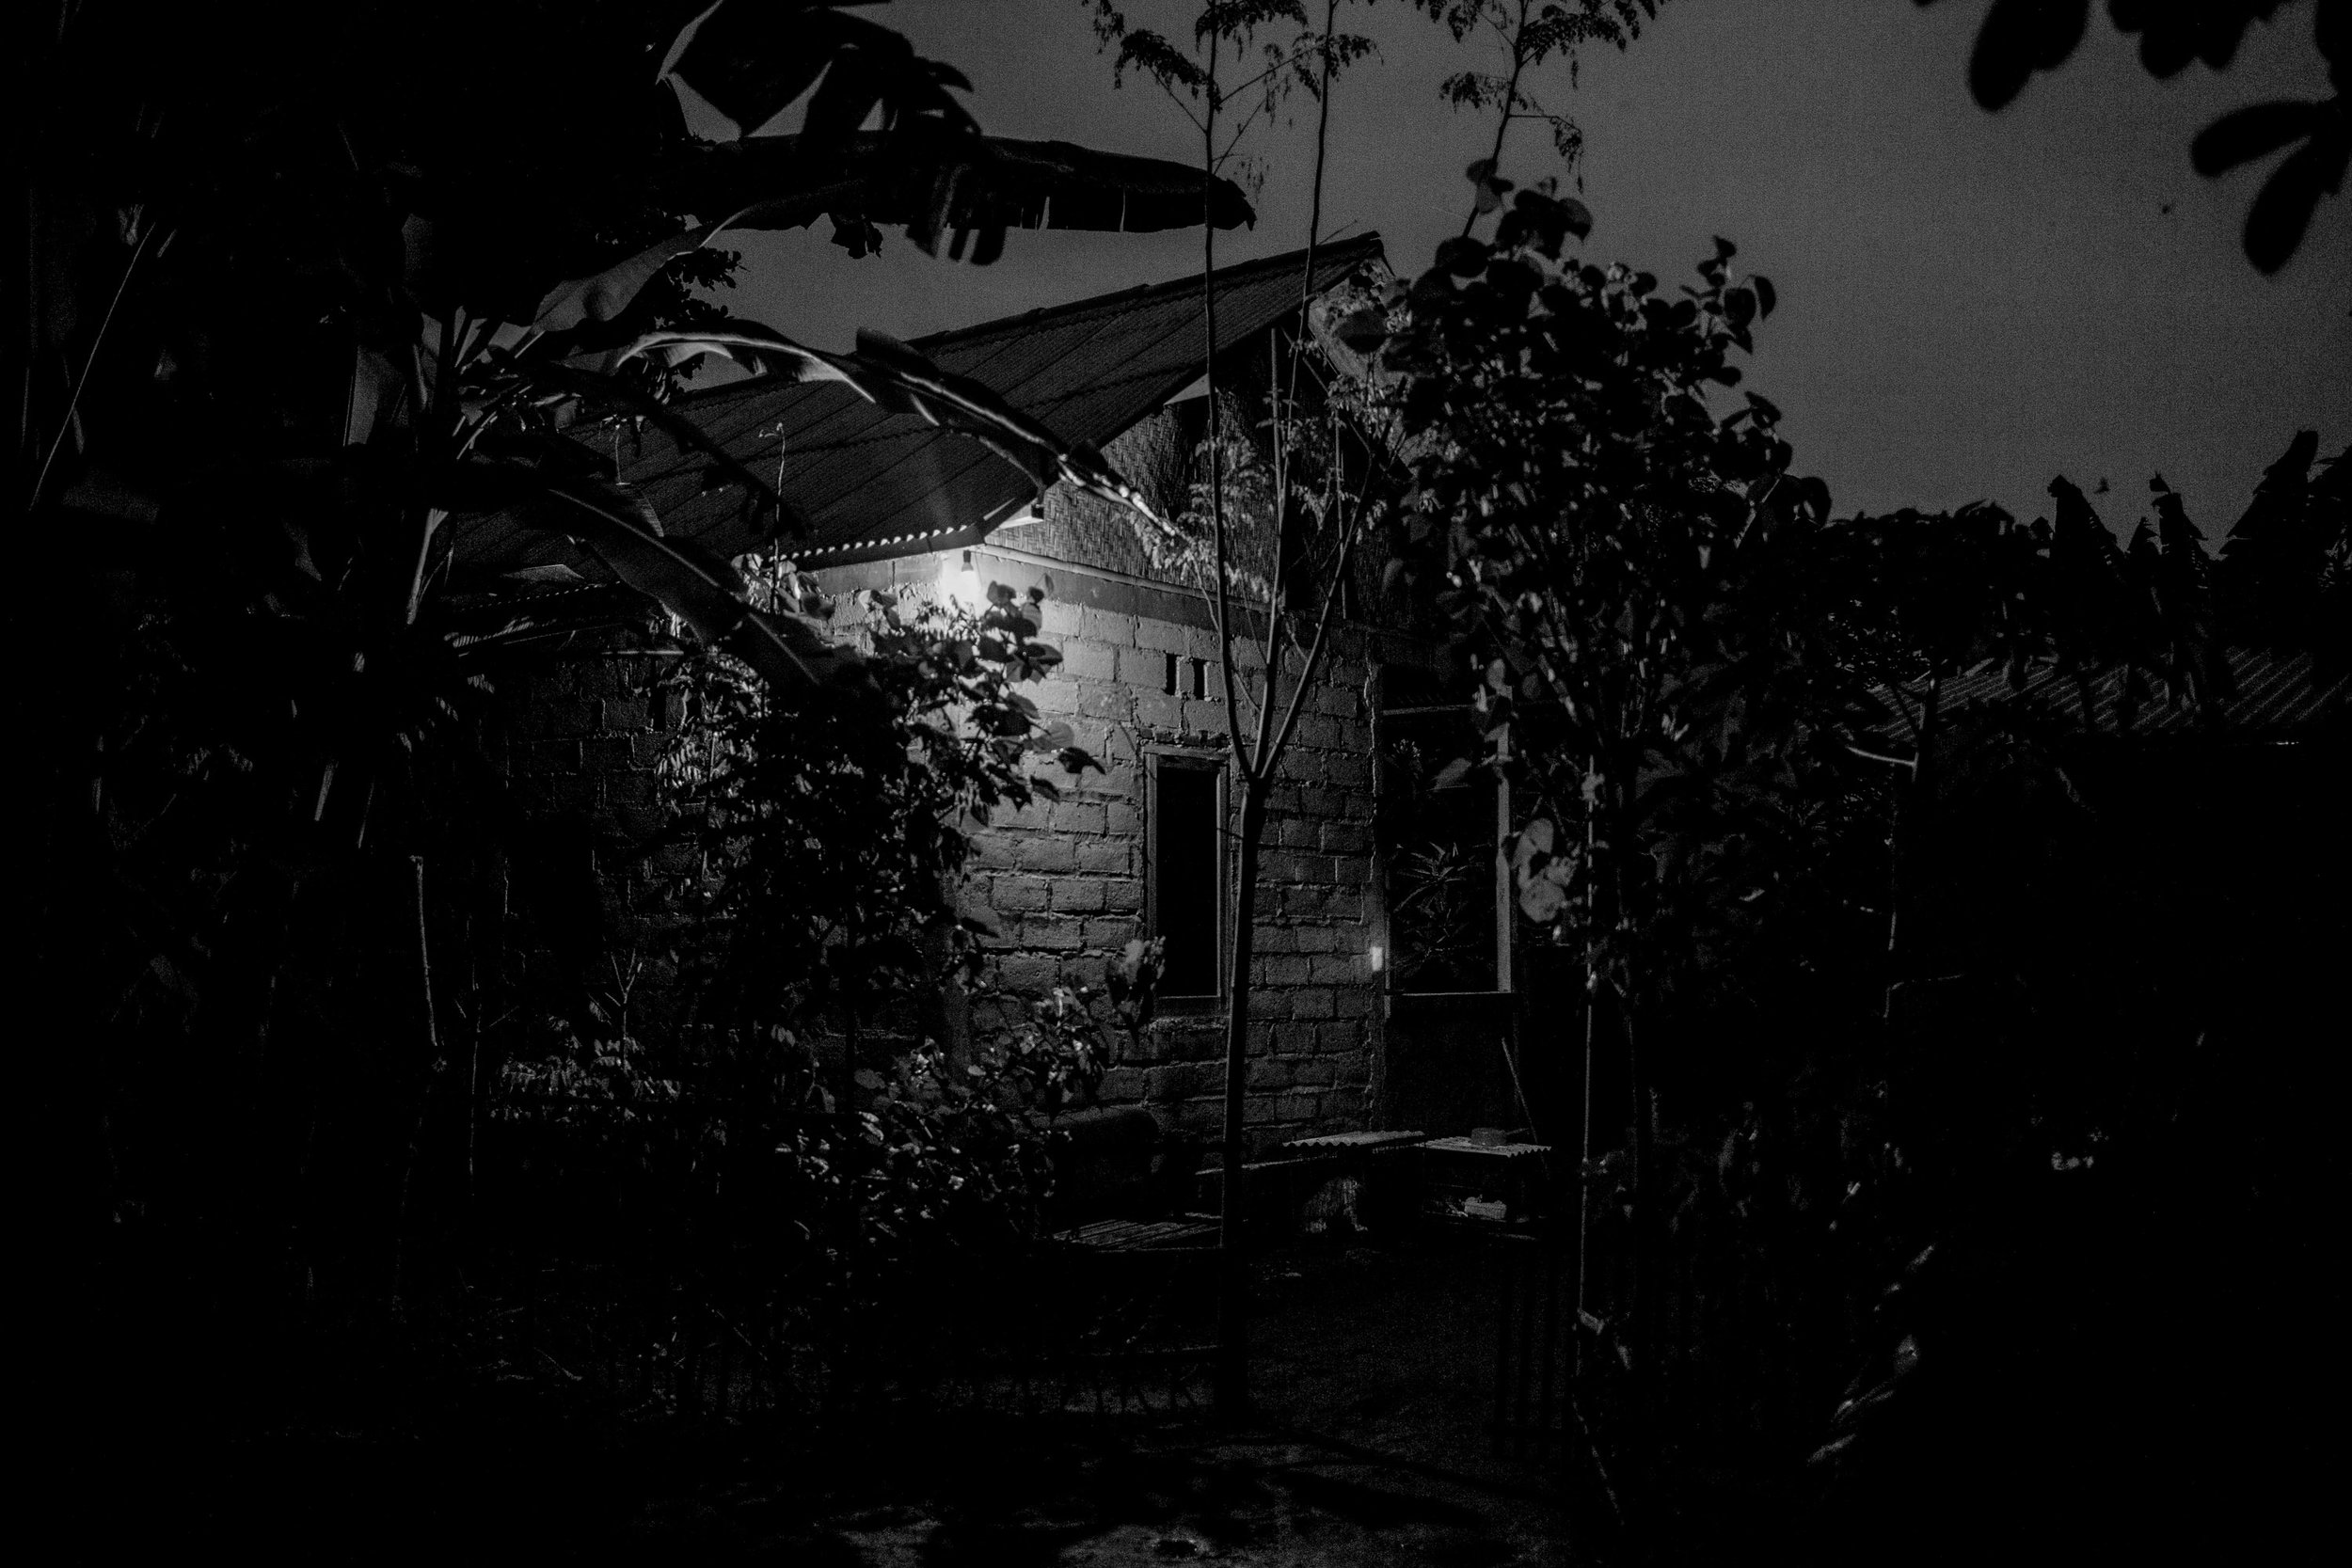 AgungParameswara_StoryGungDewi_044.jpg